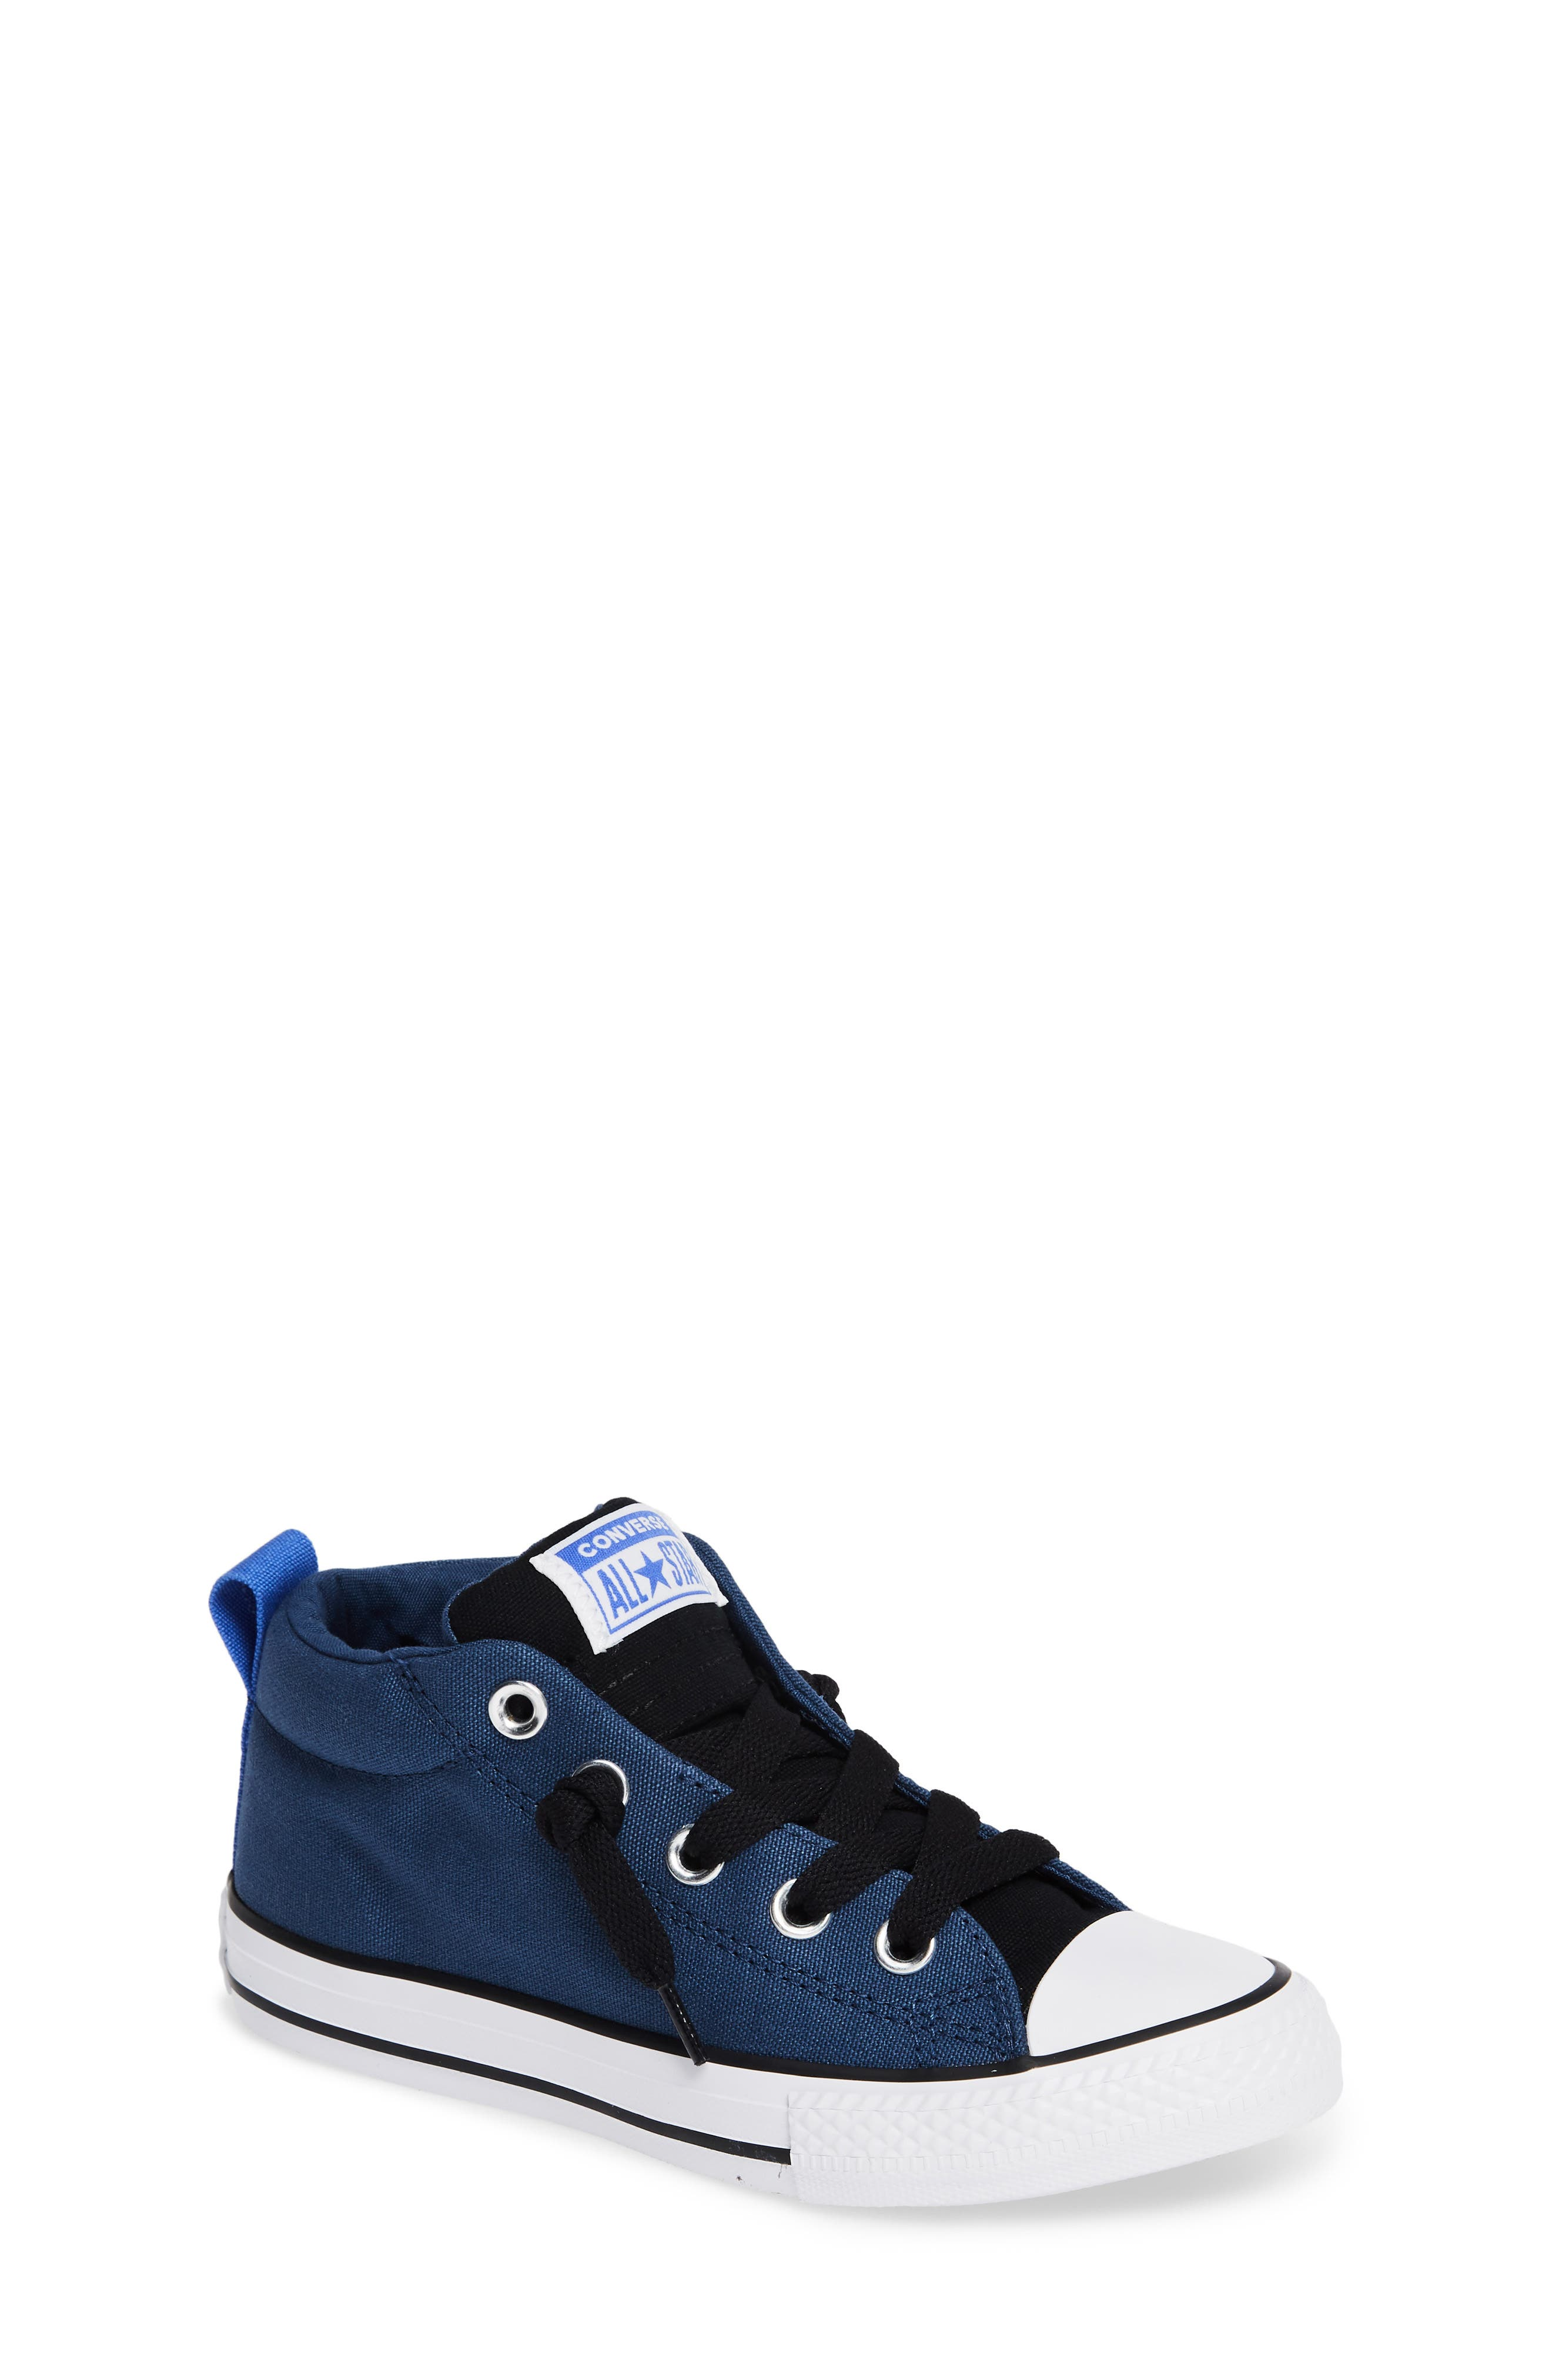 CONVERSE Chuck Taylor<sup>®</sup> All Star<sup>®</sup> Seasonal Street Sneaker, Main, color, 403